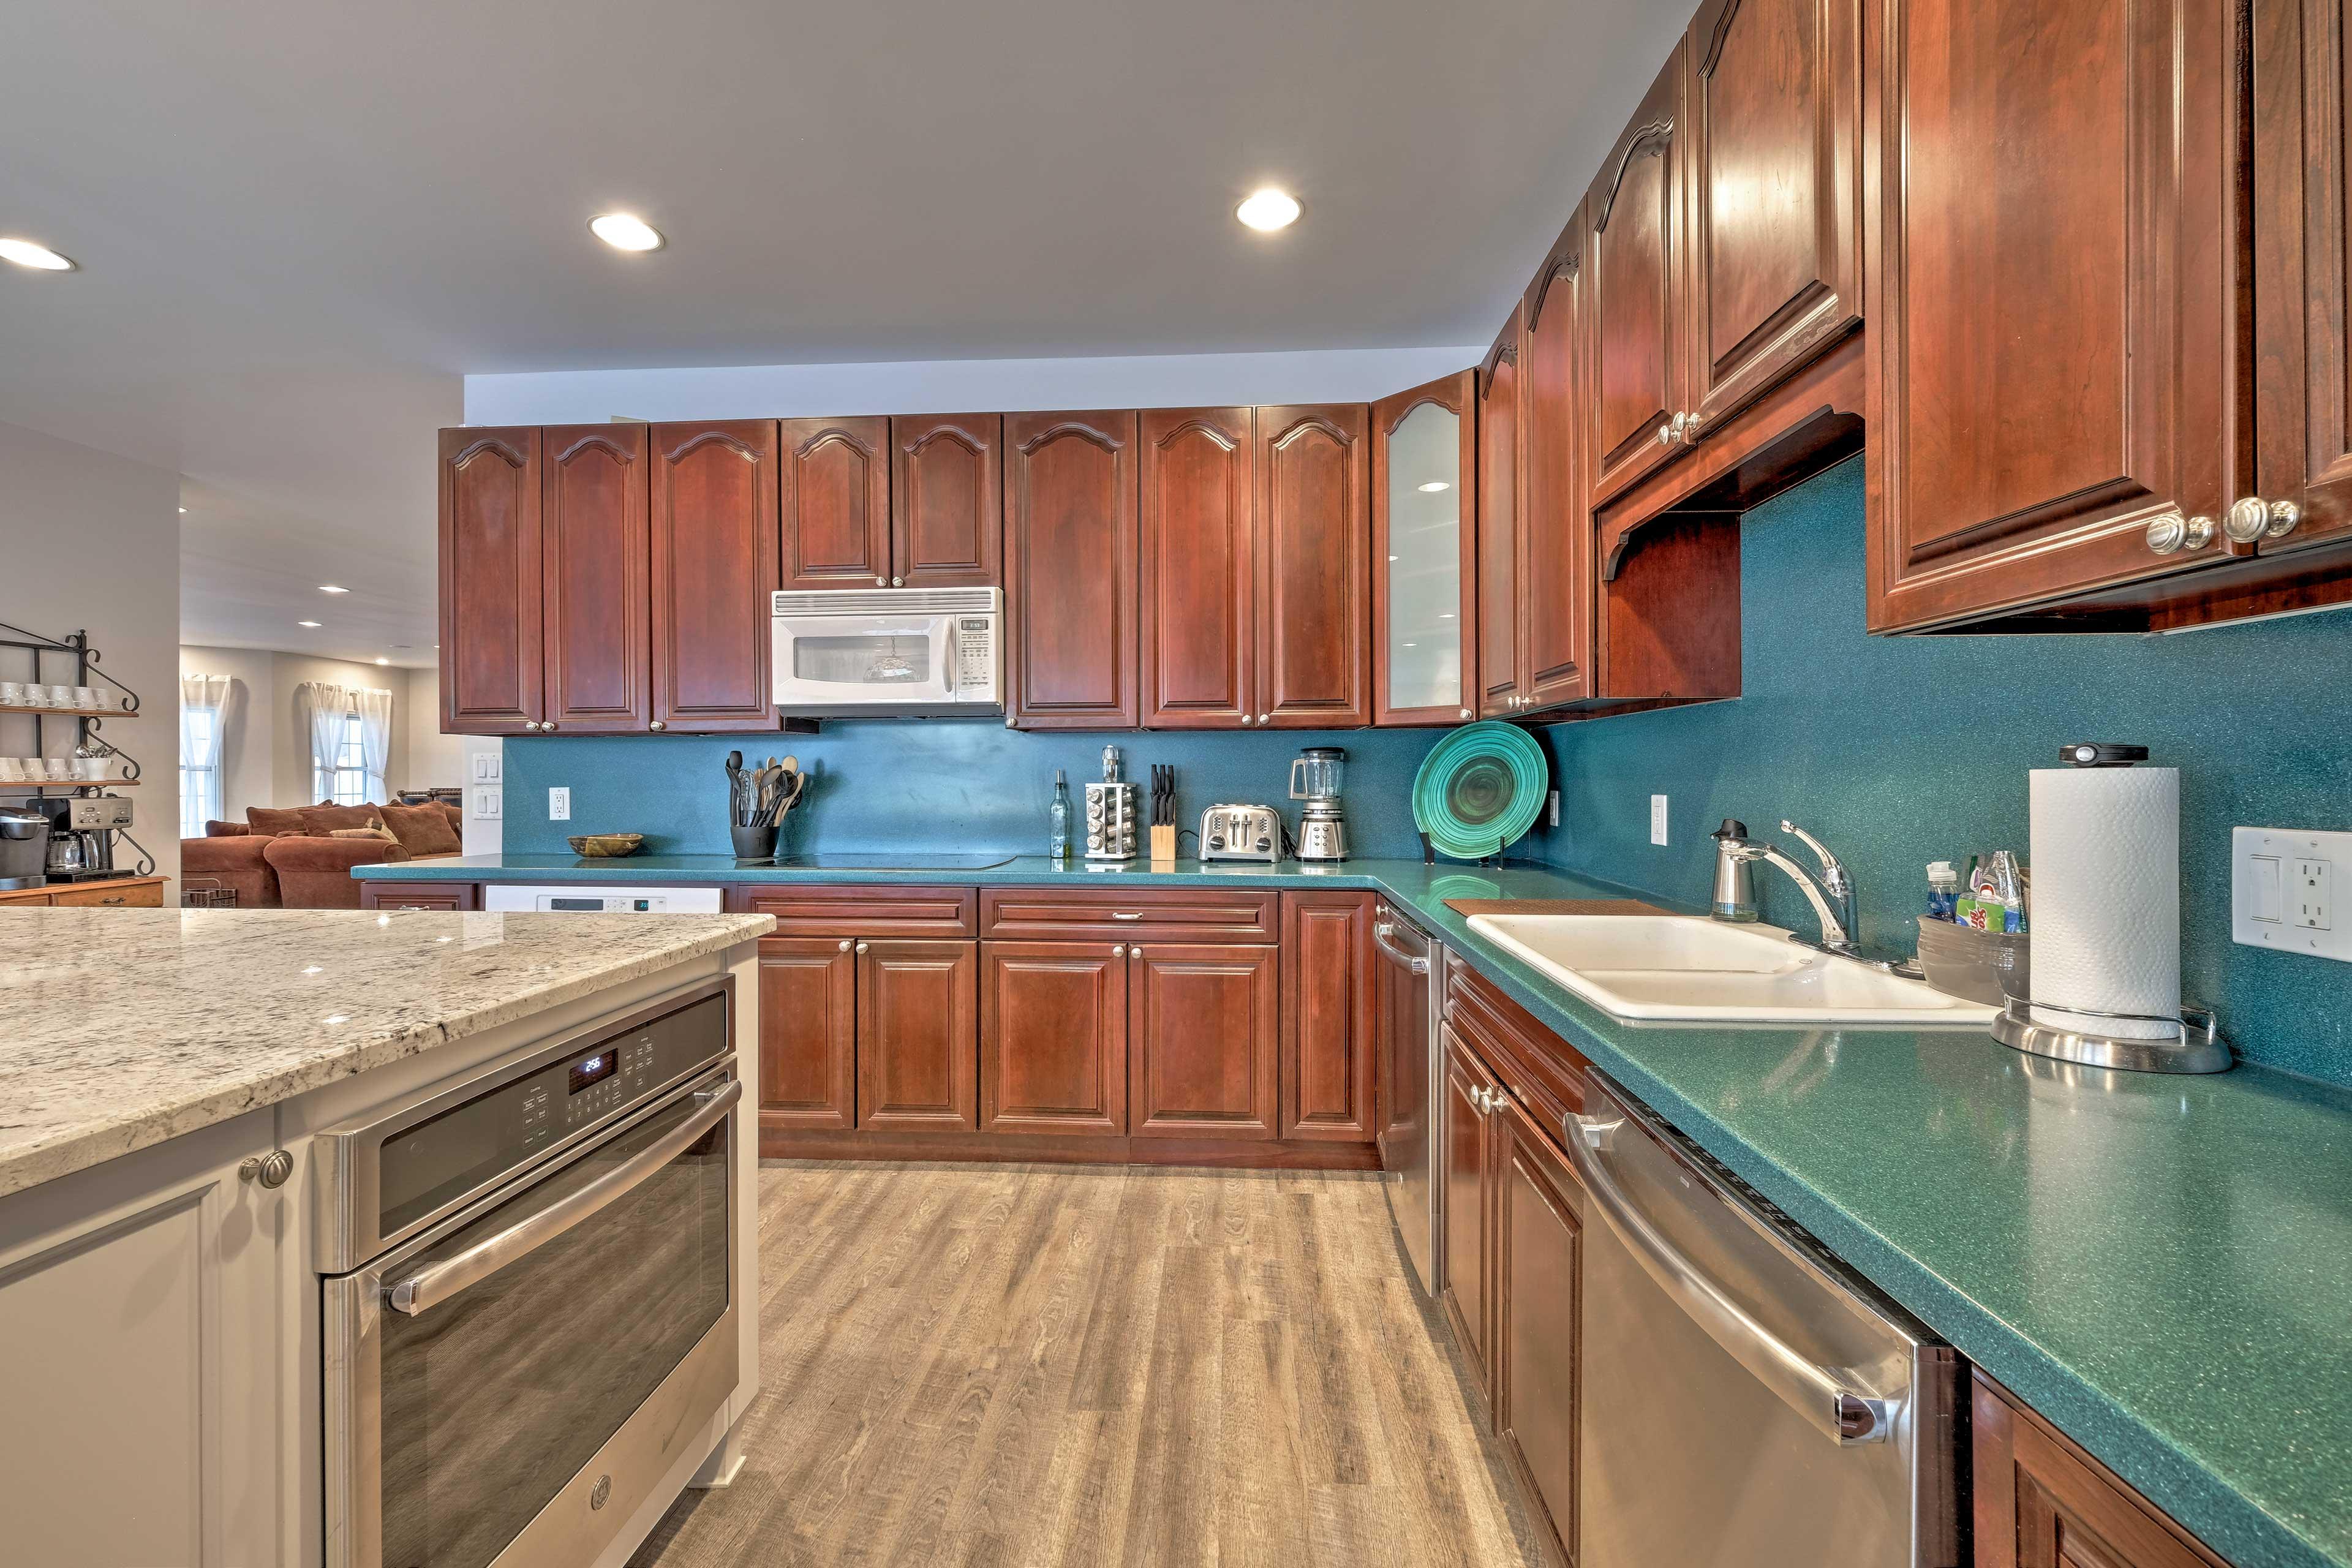 Enjoy luxurious kitchen amenities like a full knife set, blender, & spices.